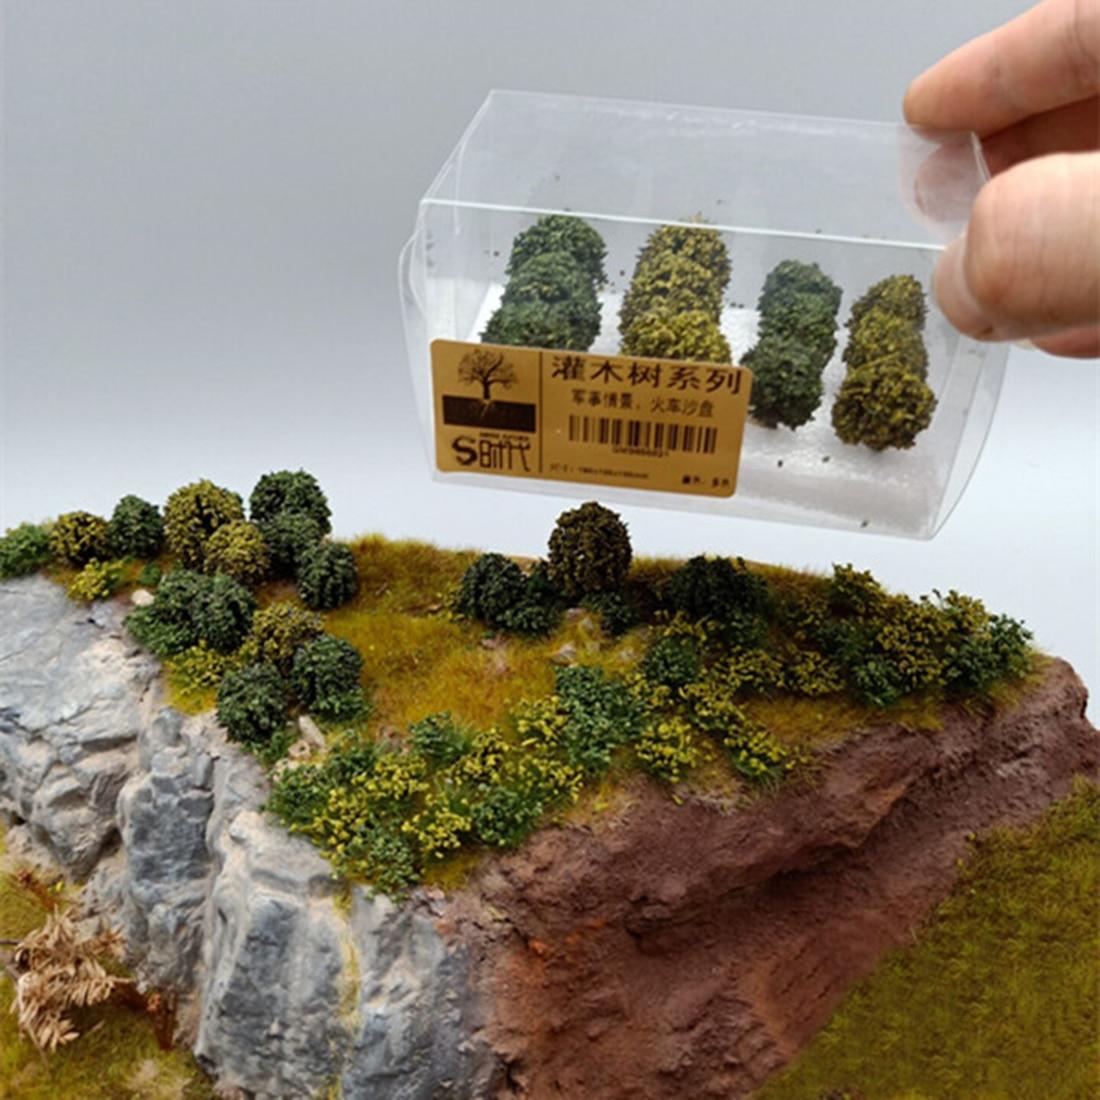 12Pcs Simulation Bush Tree Scene Model For 1:35/1:48/1:72/1:87 Scale Sand Table Model Building Kits